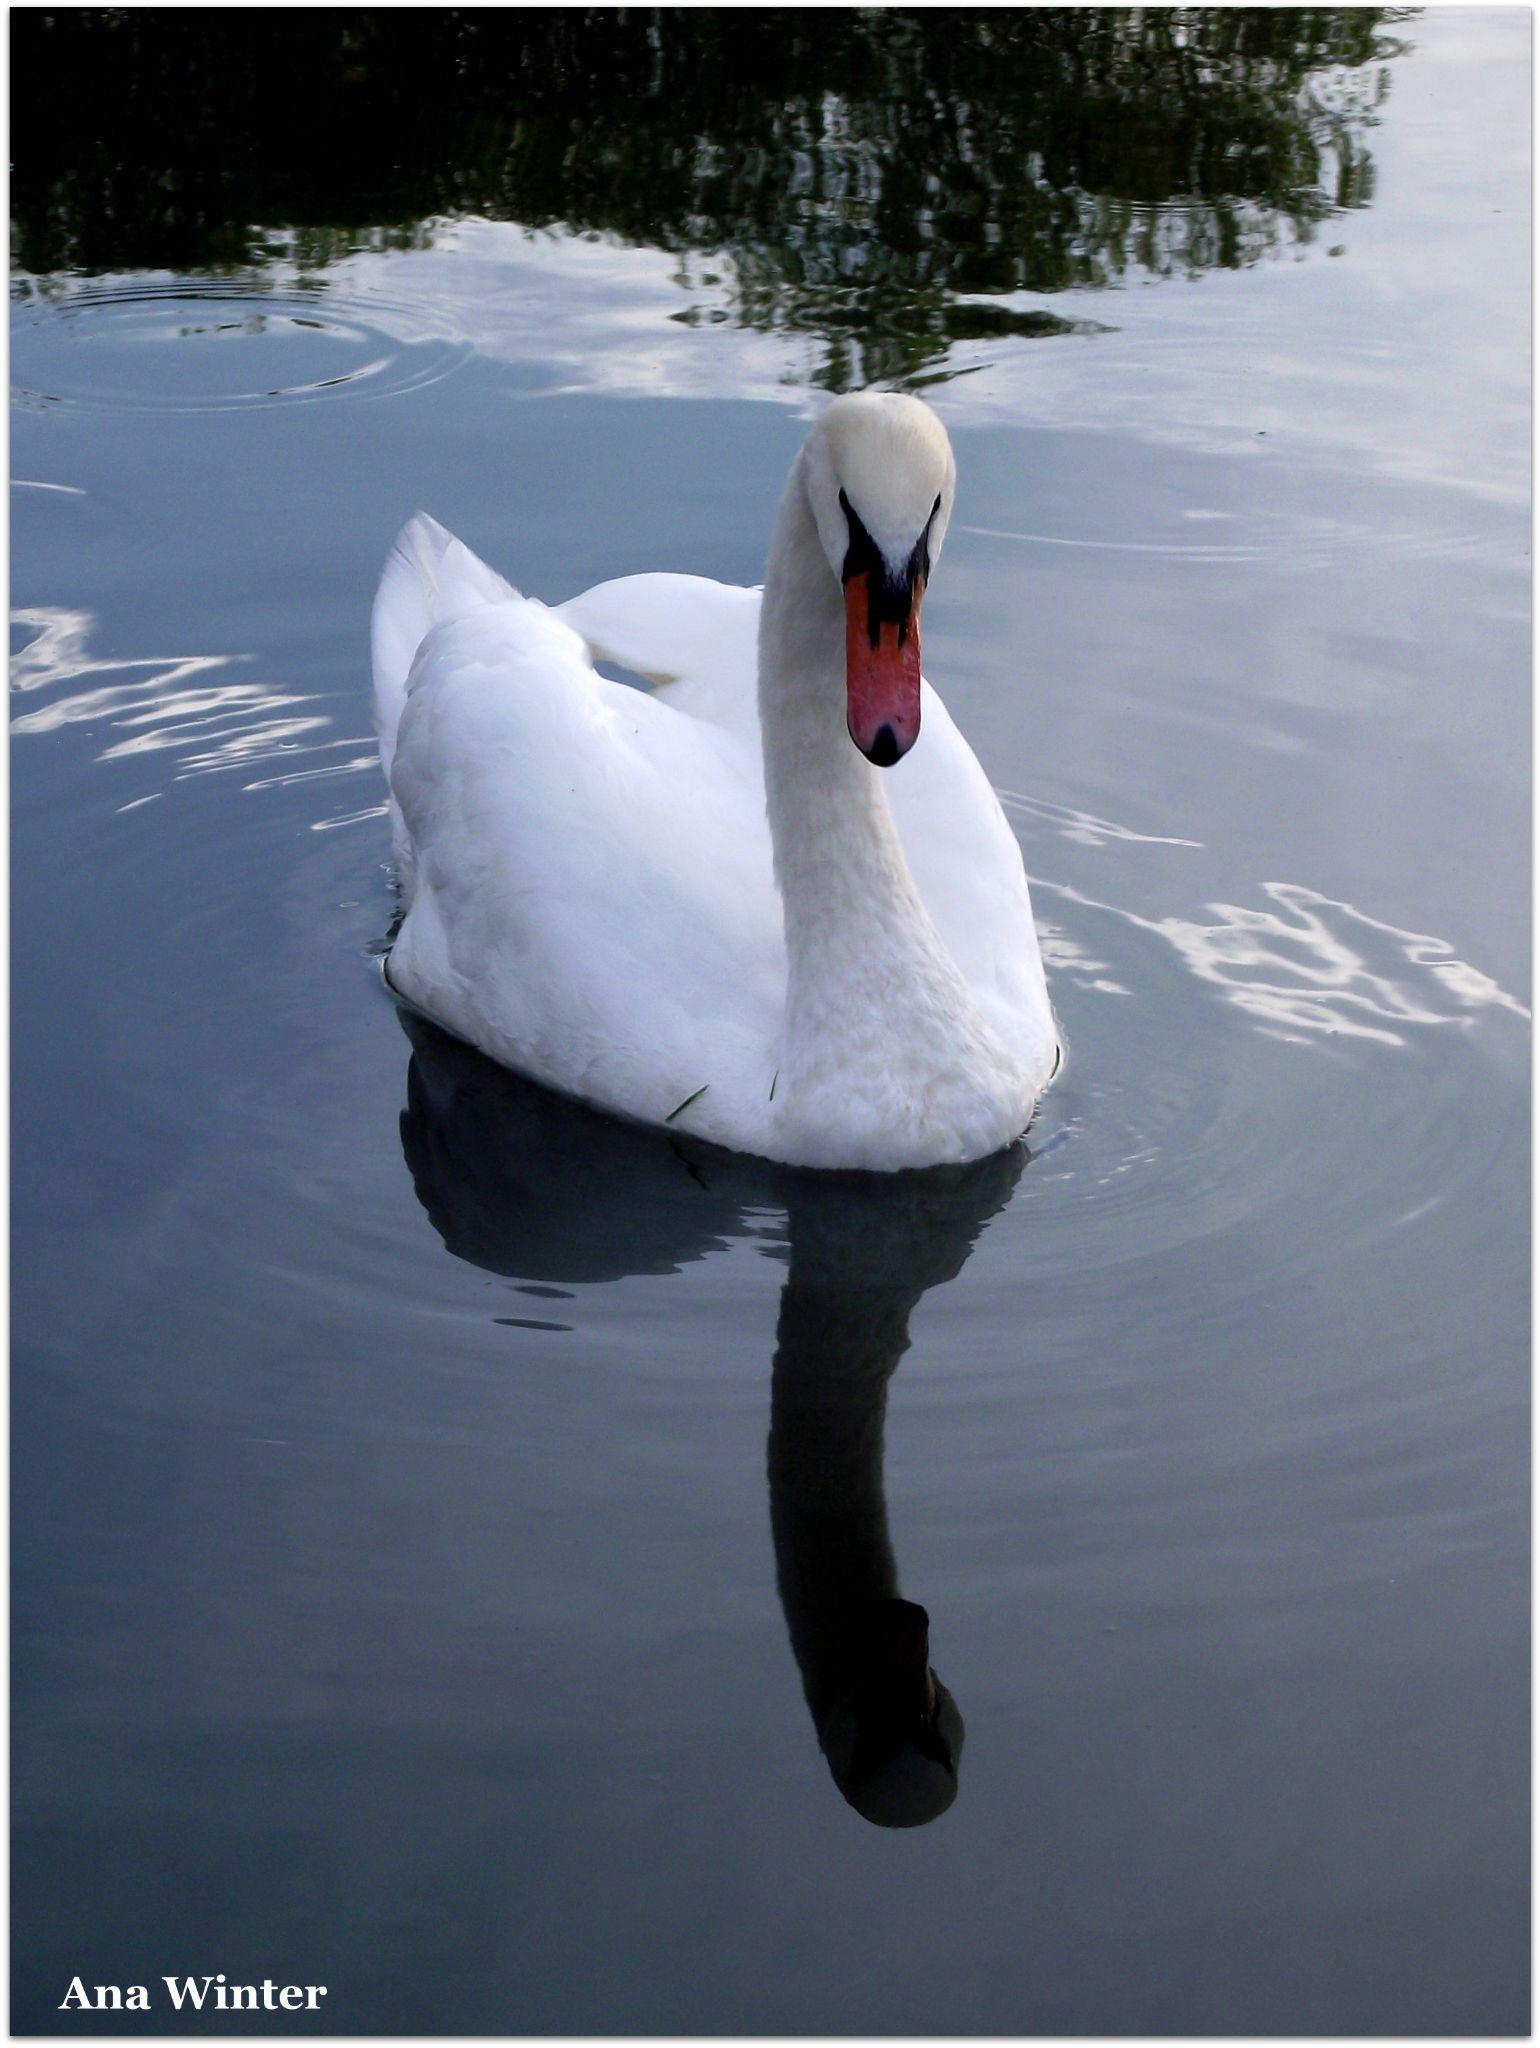 Gliding swan by Ana Winter